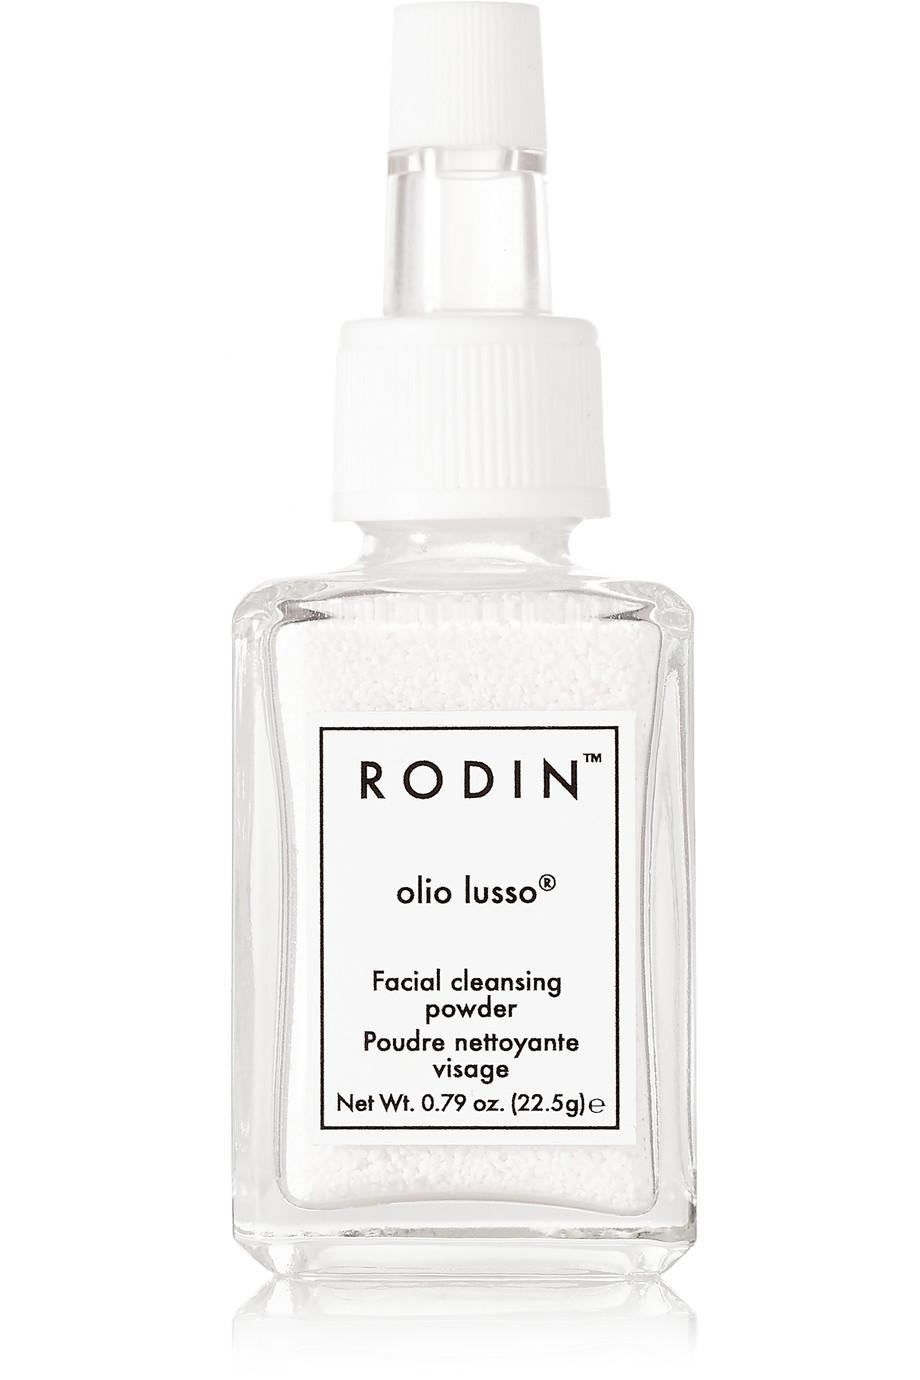 Rodin Facial Cleansing Powder ($45)